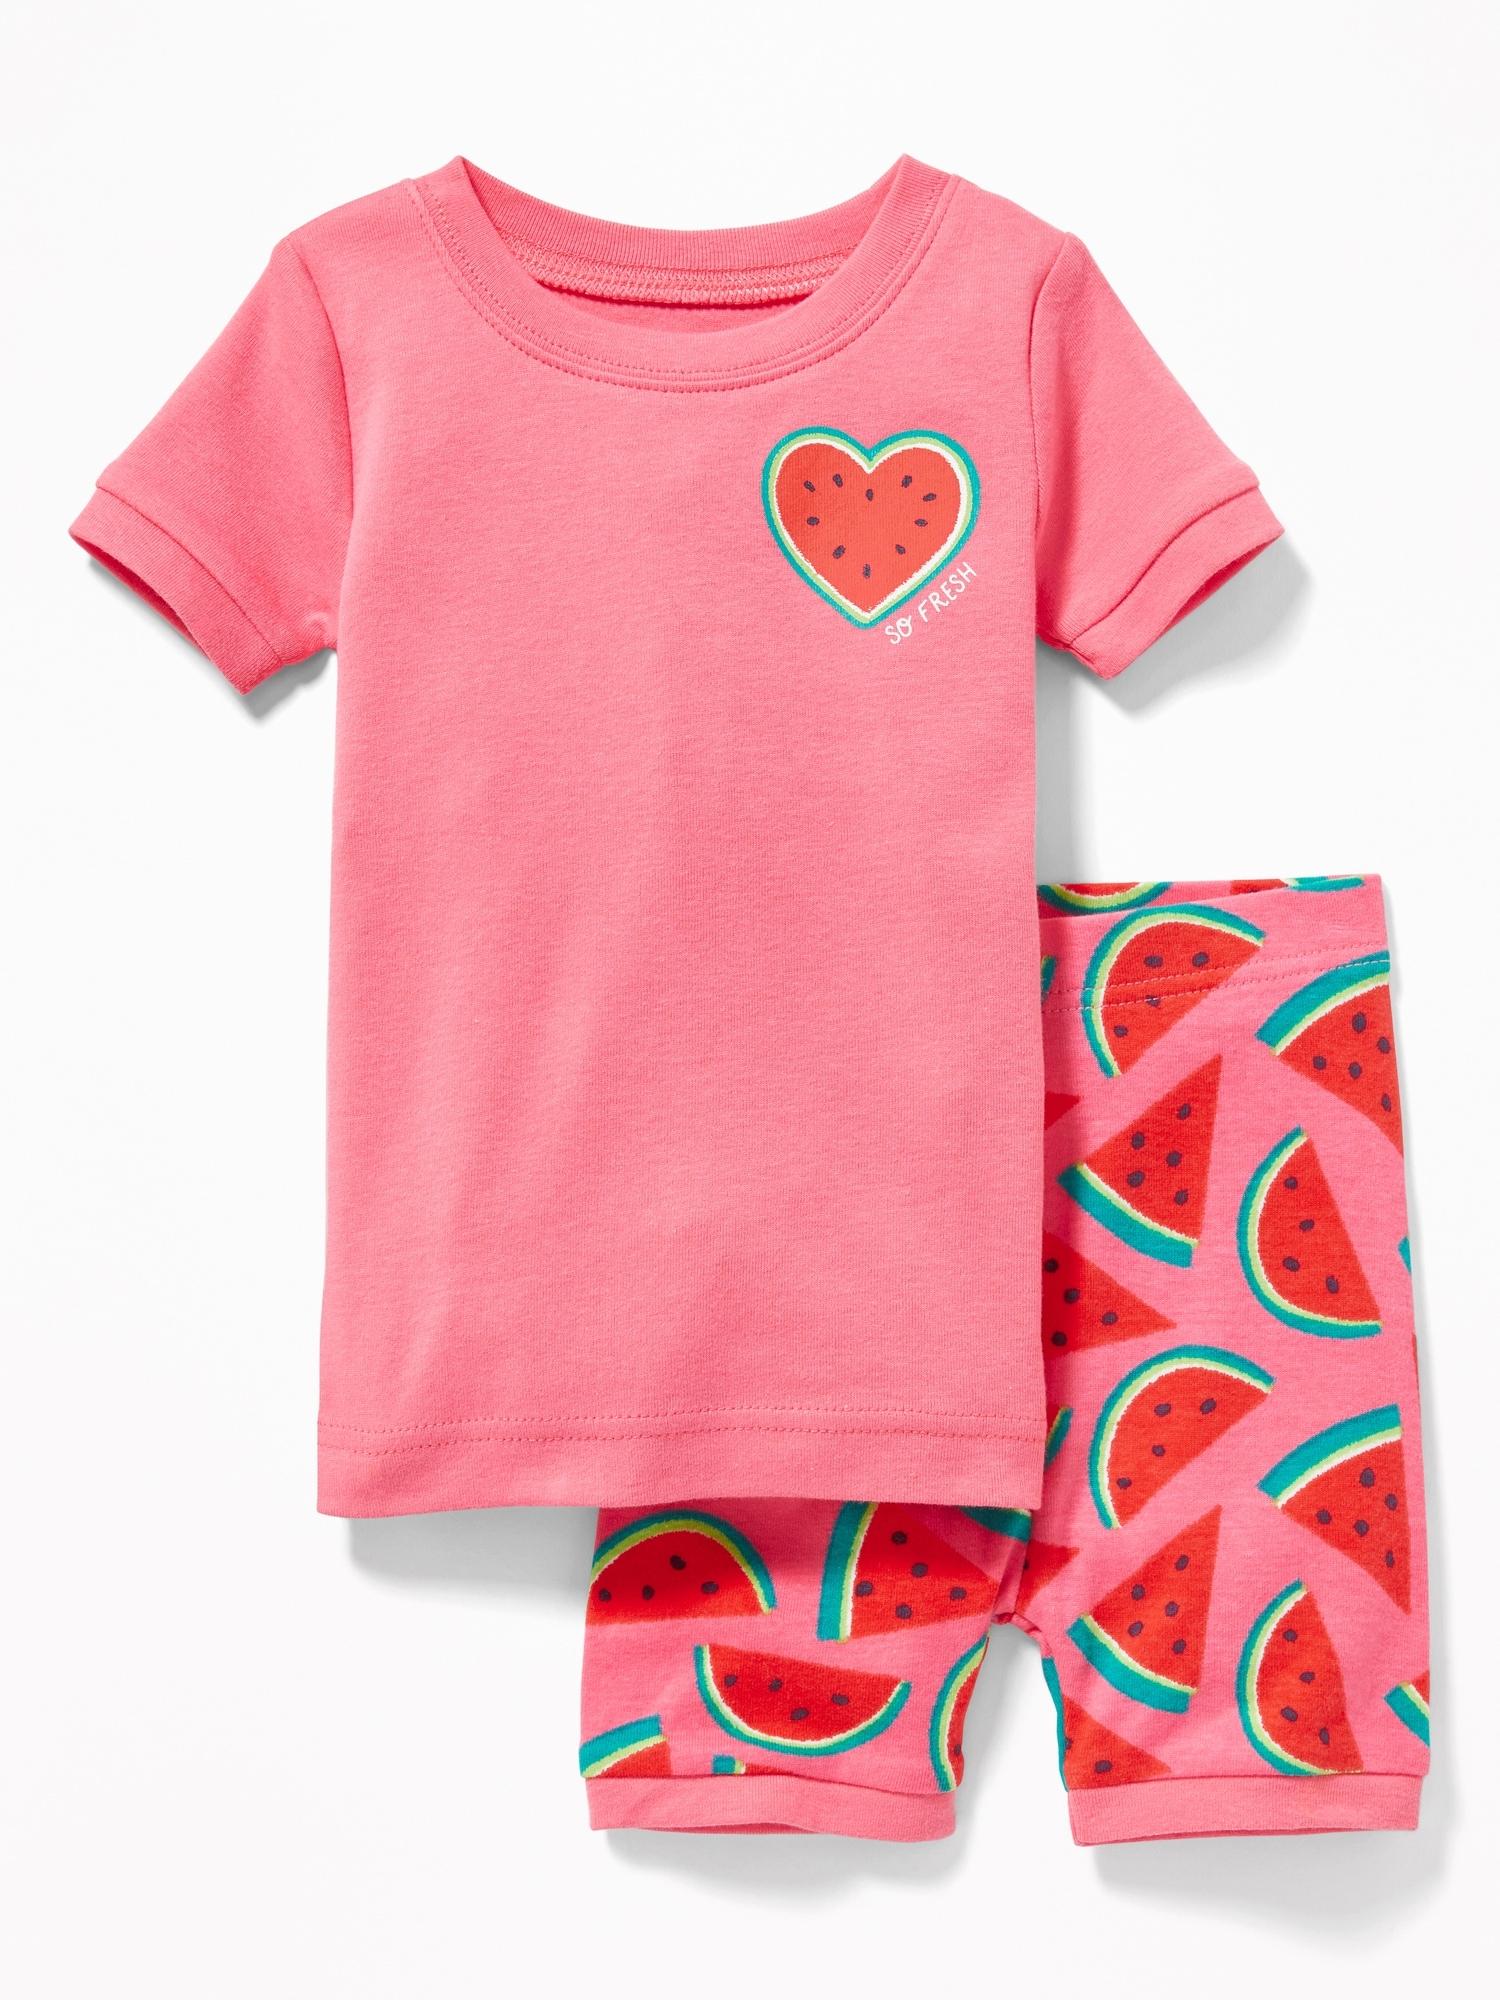 GAP Kids Disney Minnie Mouse Watermelon Shorts Pajamas 12